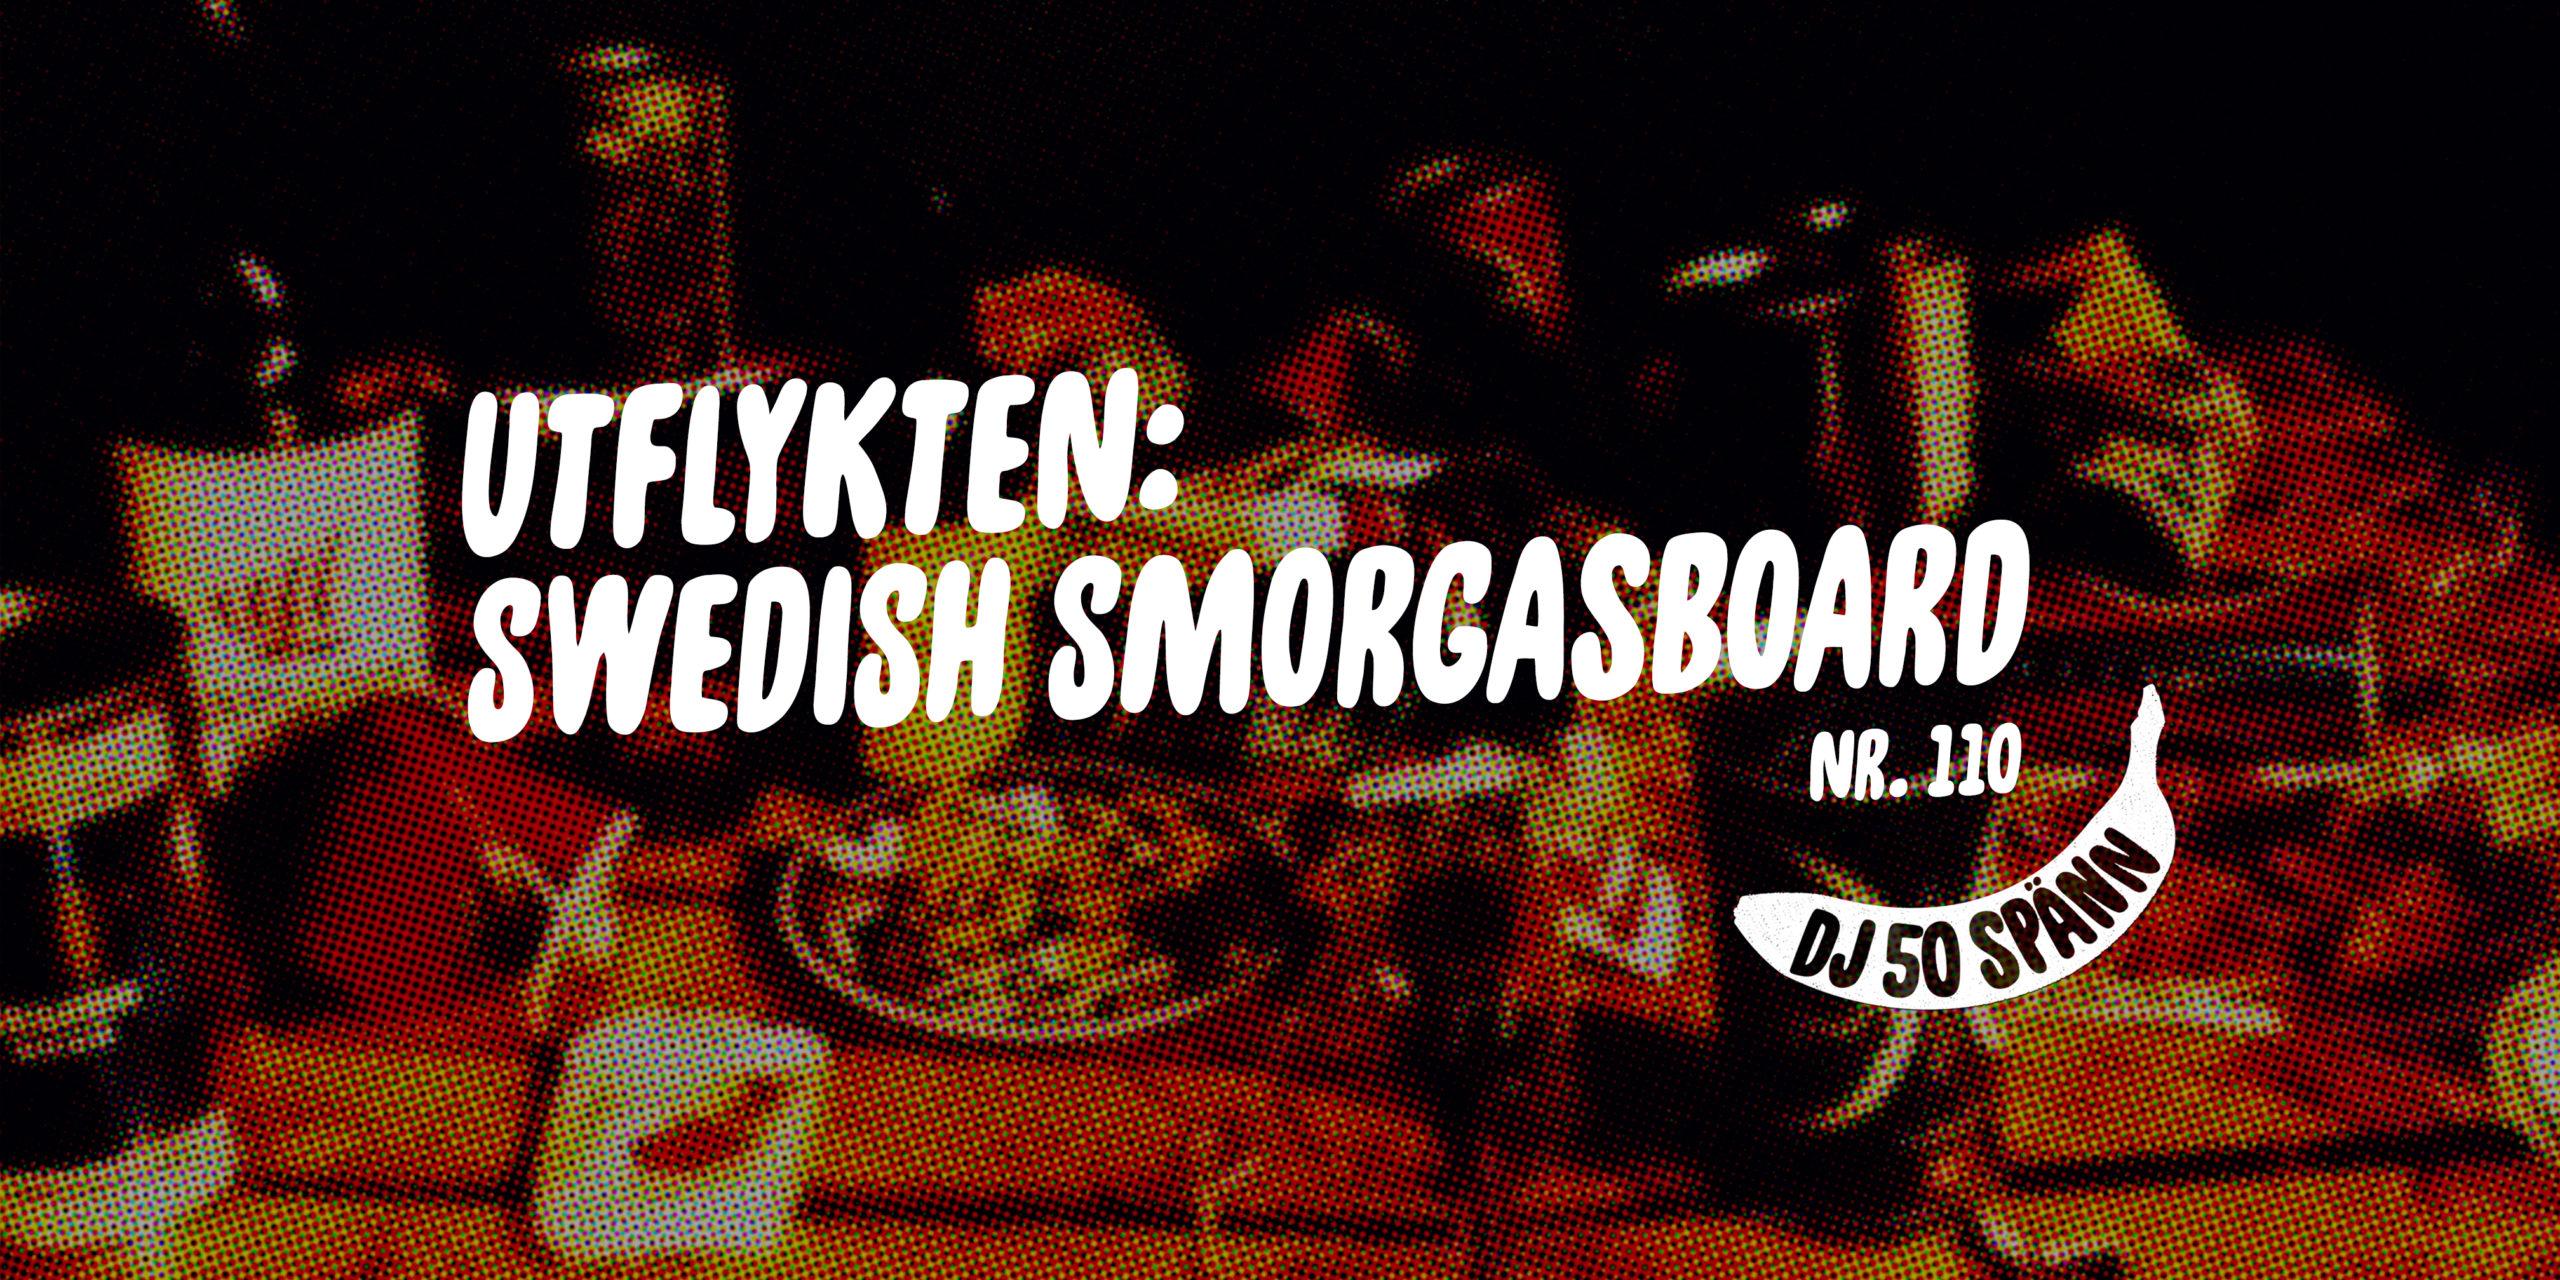 utflykten swedish smorgosboard